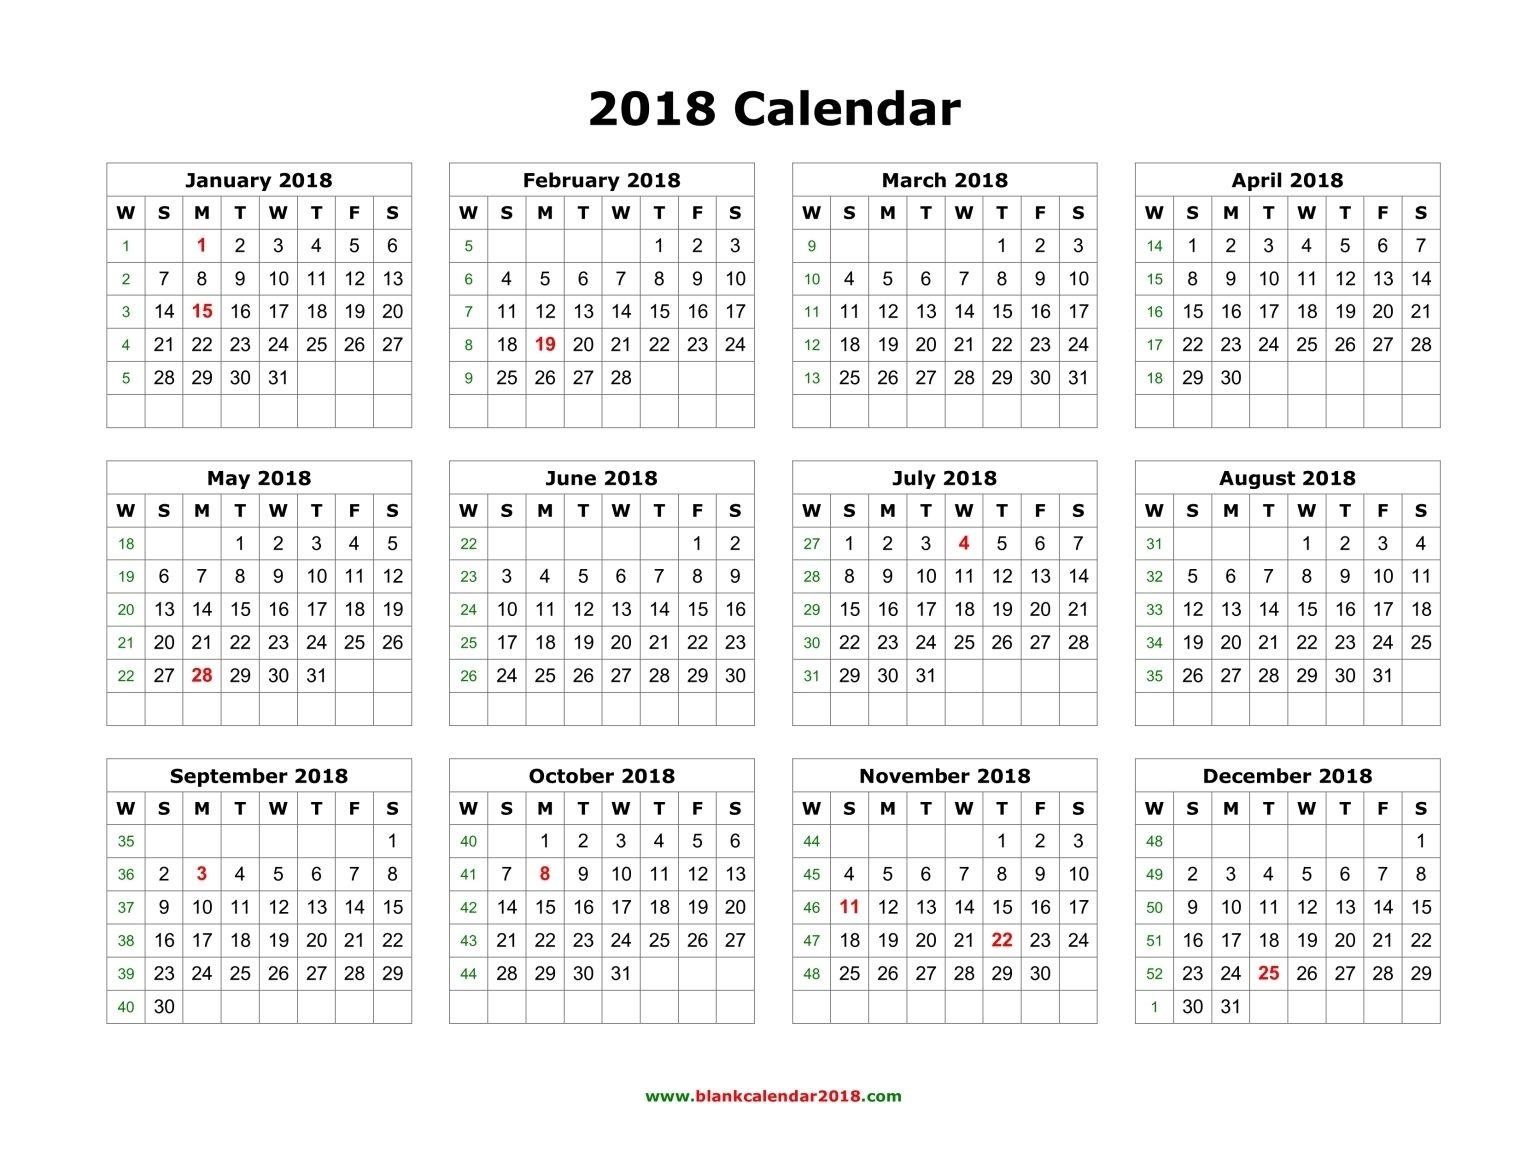 Year Calendar Print Out : Calendar printable yearly blank